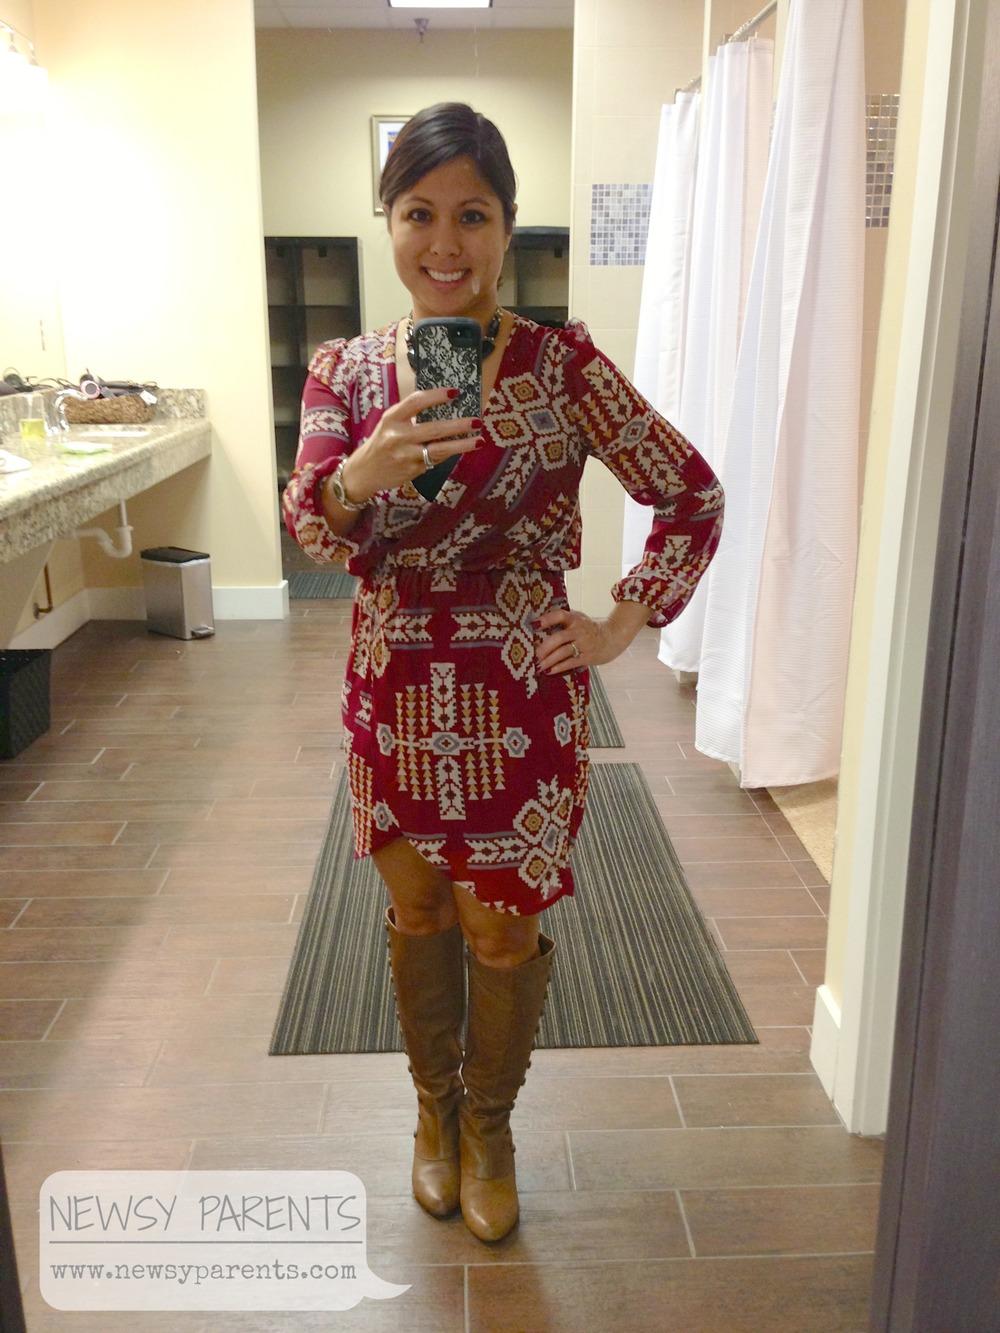 Aztec print dress from Etiquette Boutique. Boots from Joyfolie.